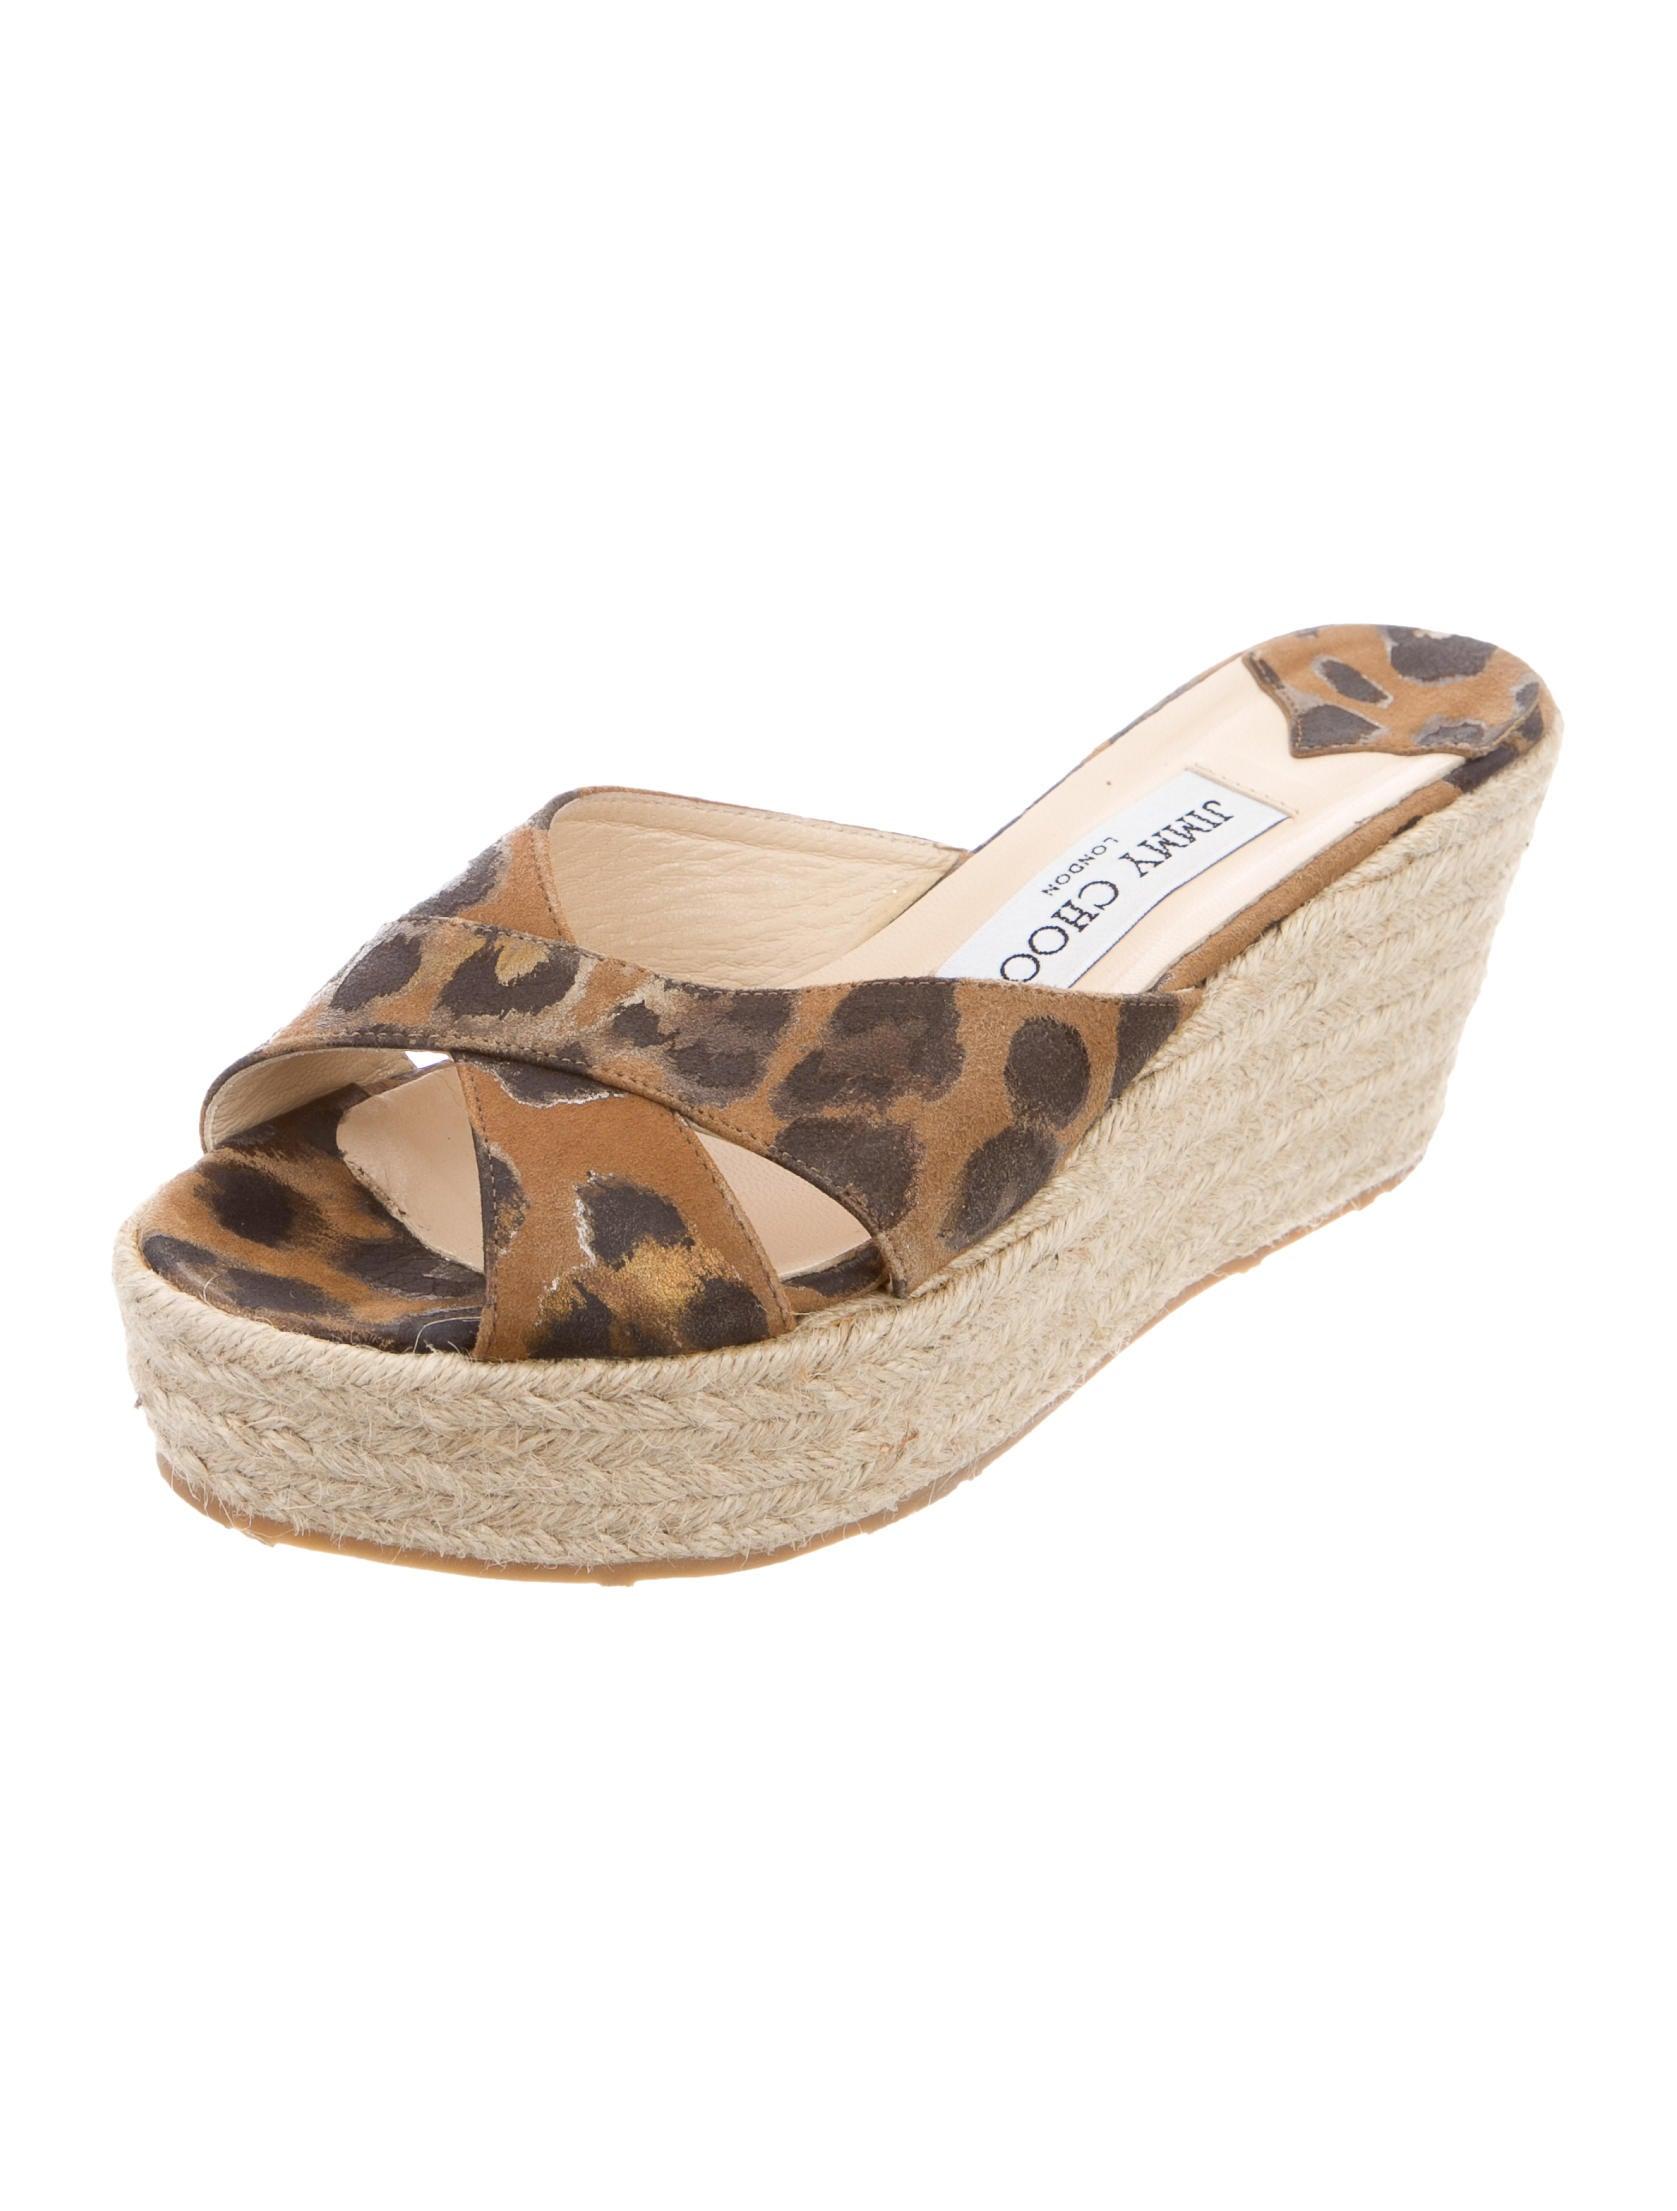 jimmy choo leopard espadrille wedge sandals shoes